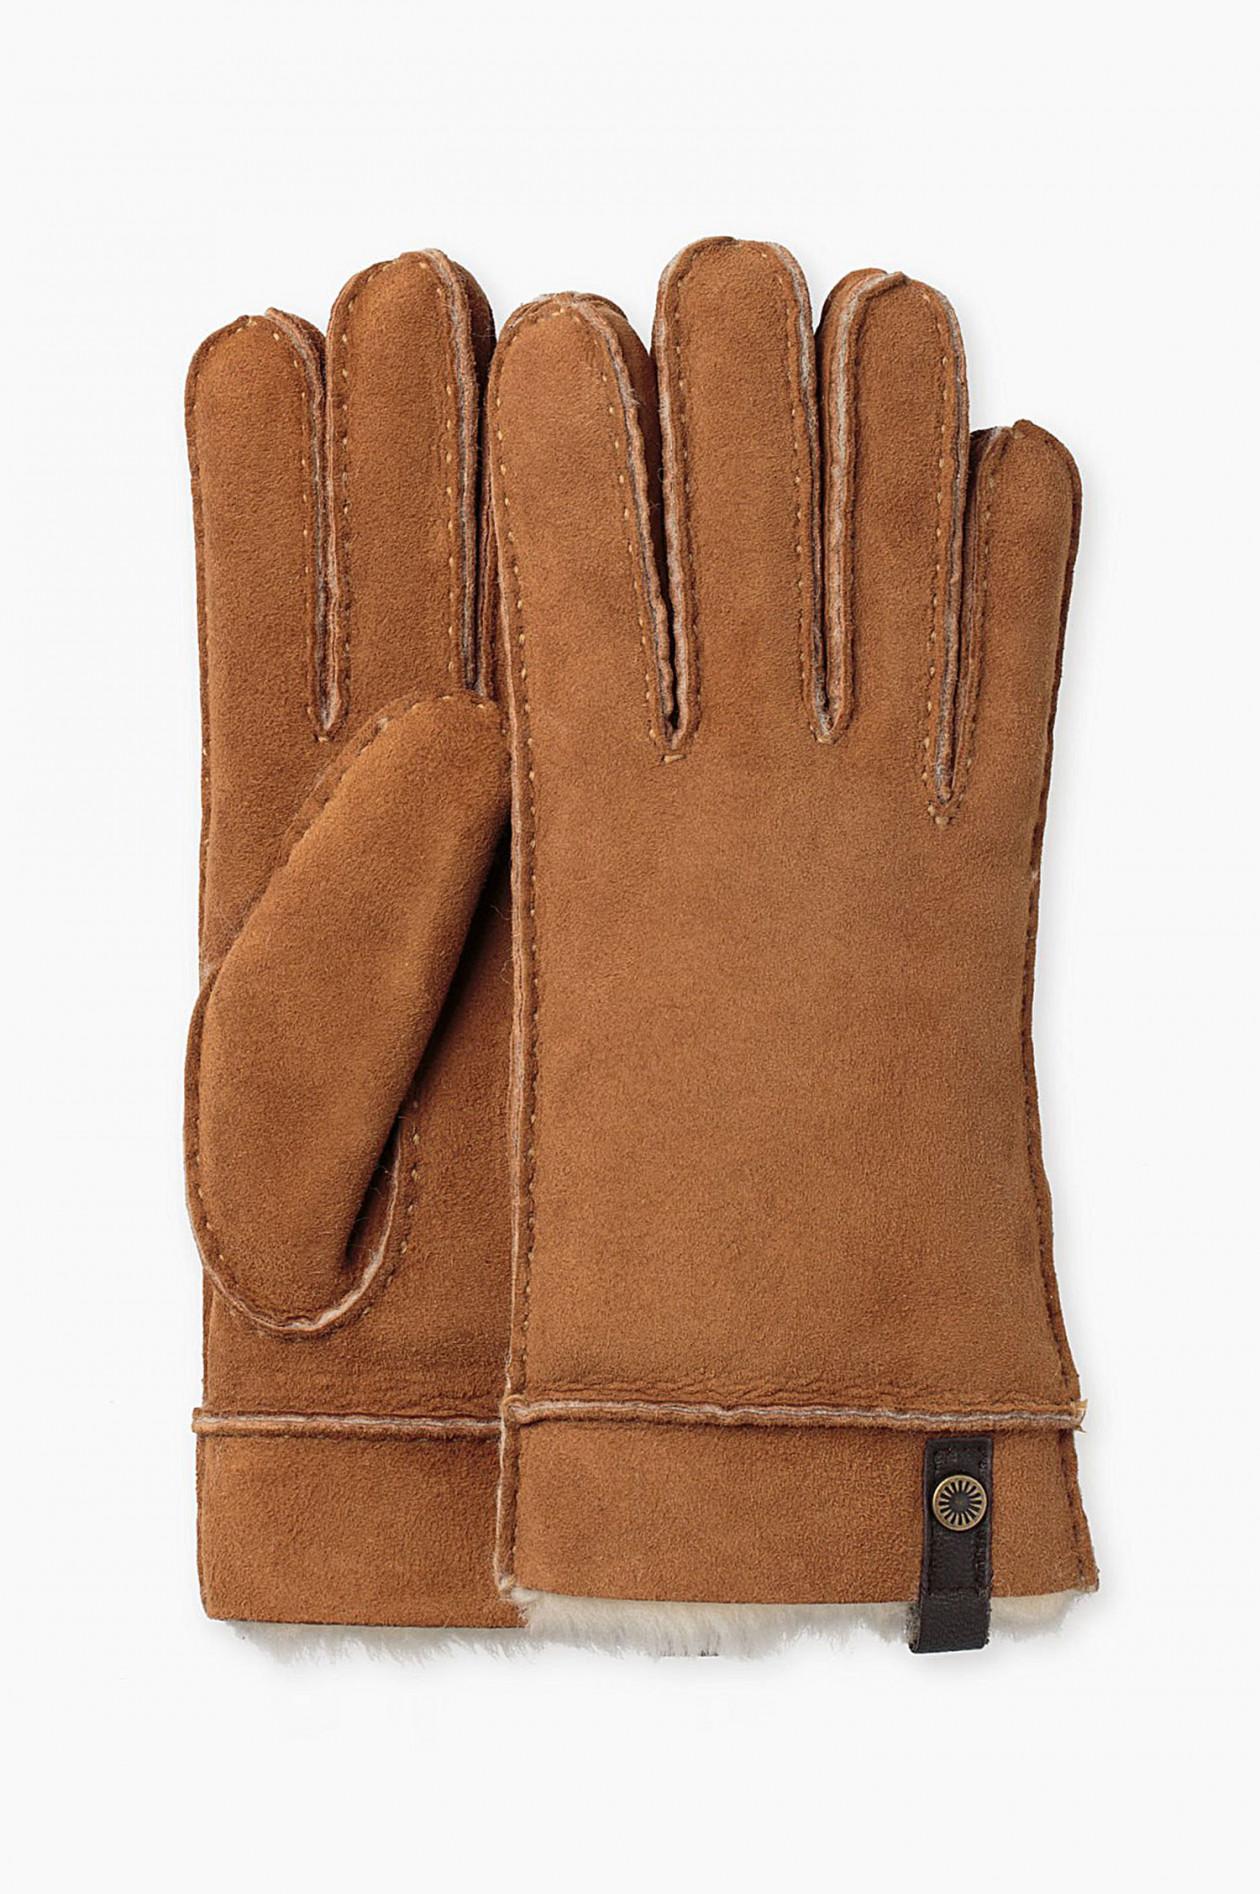 Handschuhe aus Lammfell in Chestnut